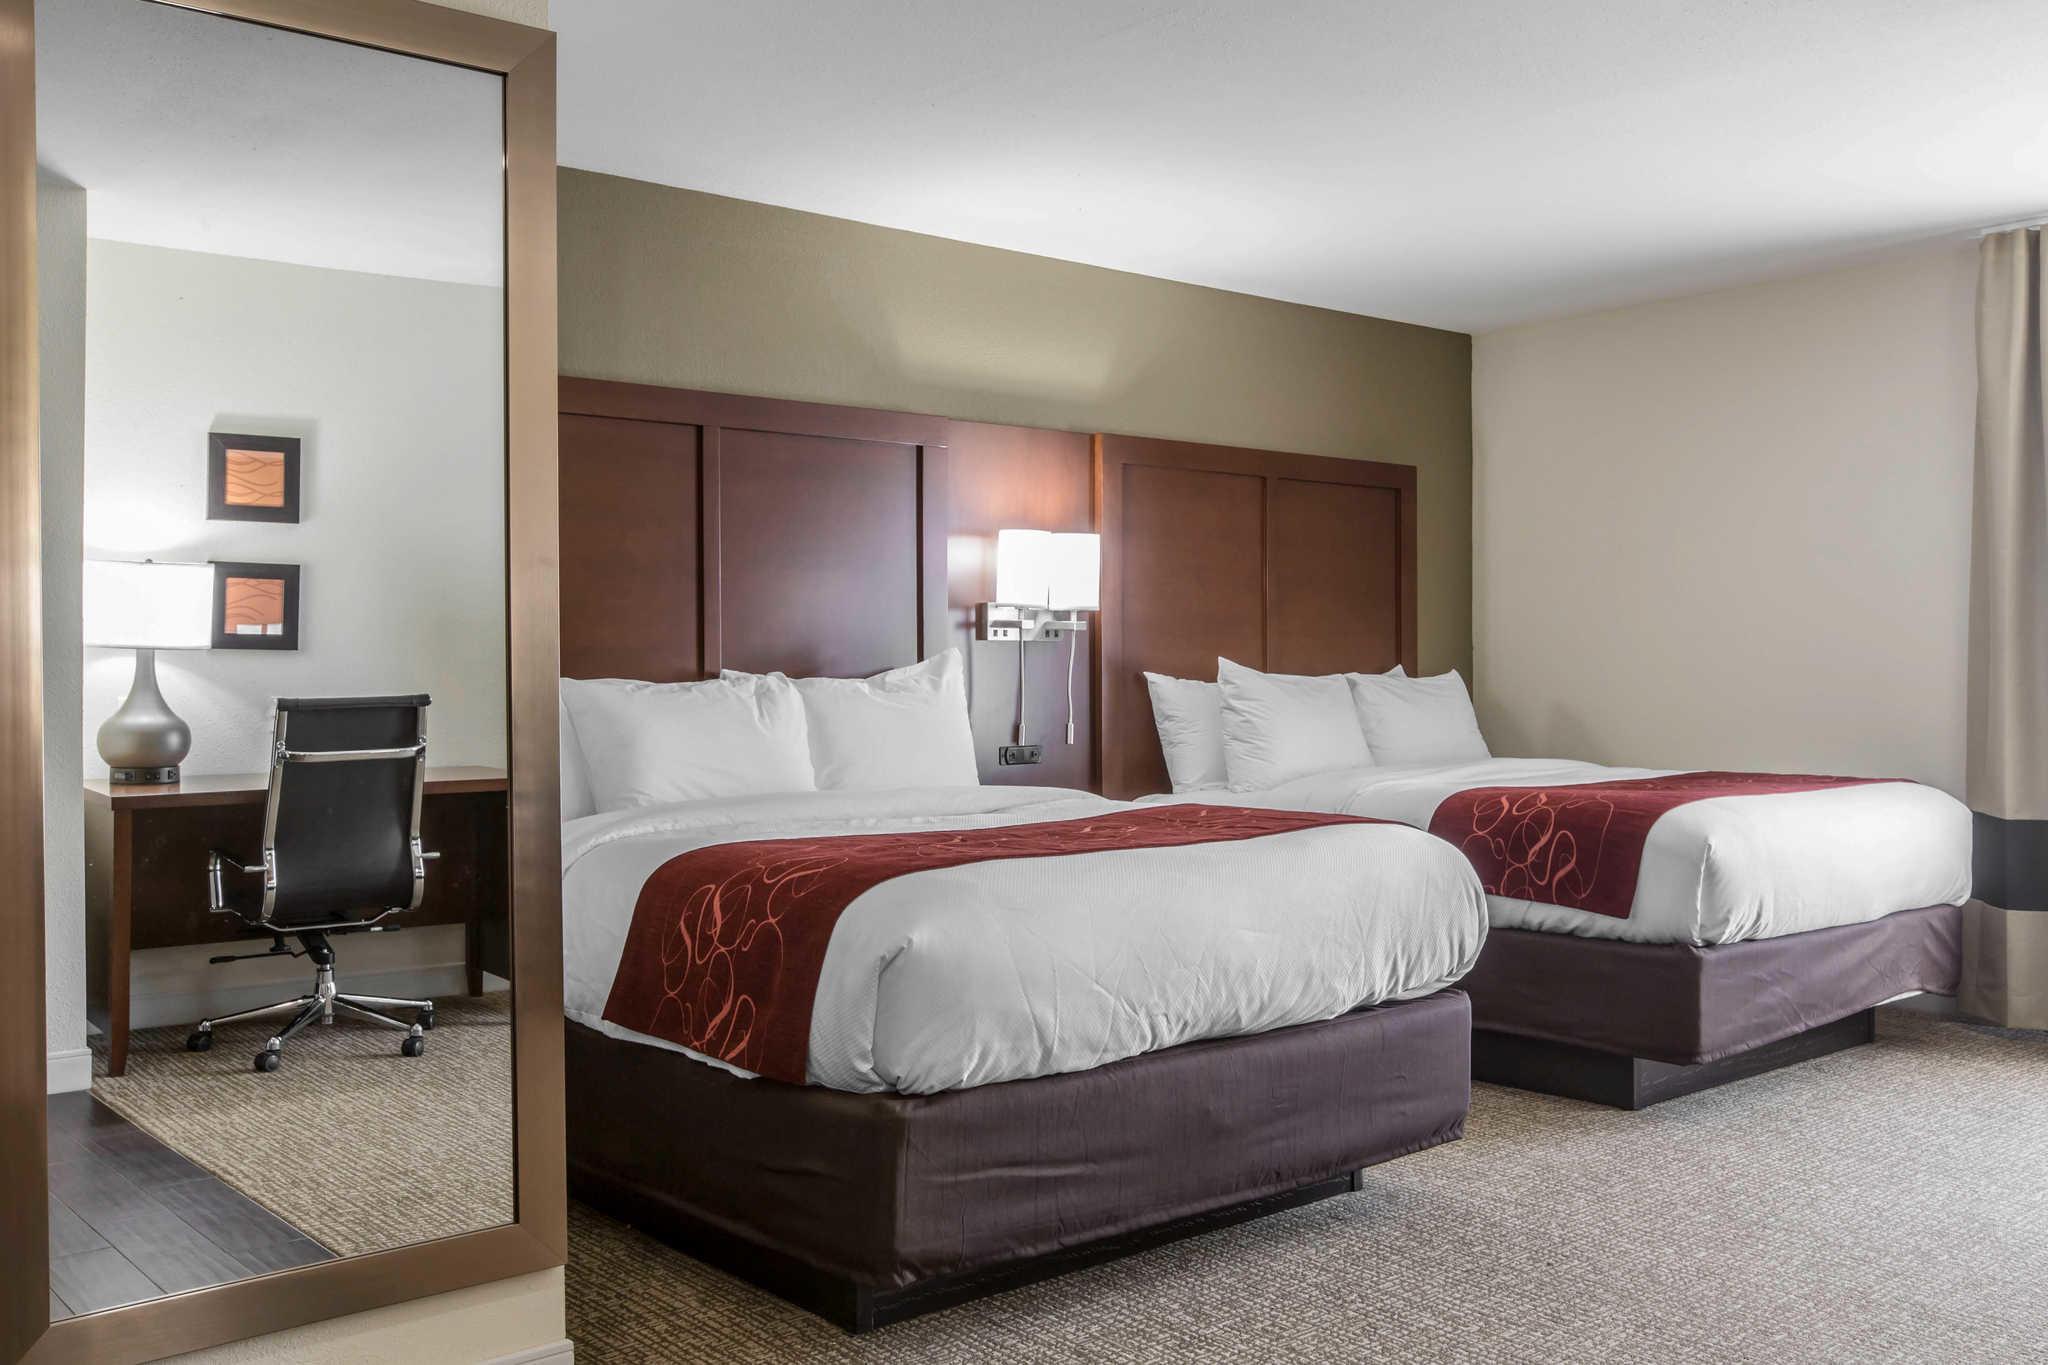 Comfort Inn & Suites West image 19